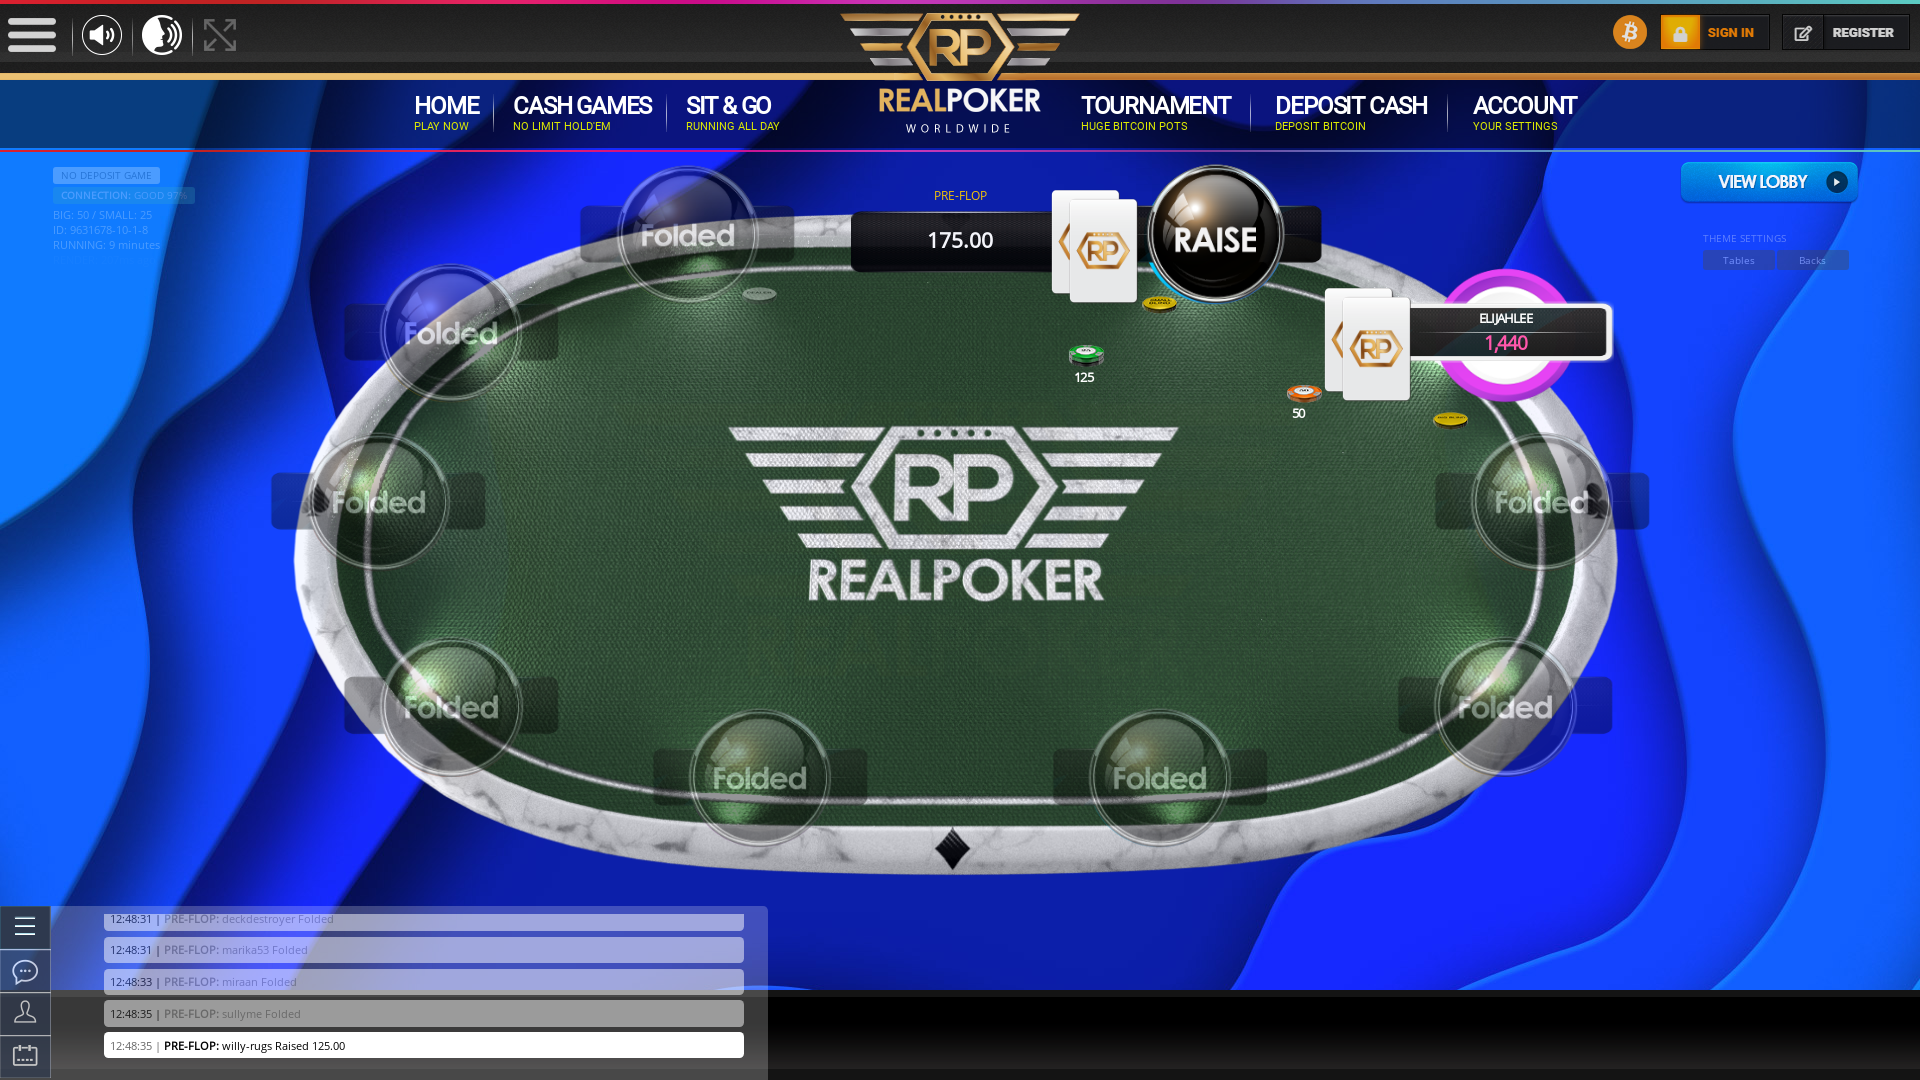 cashman casino slots free coins